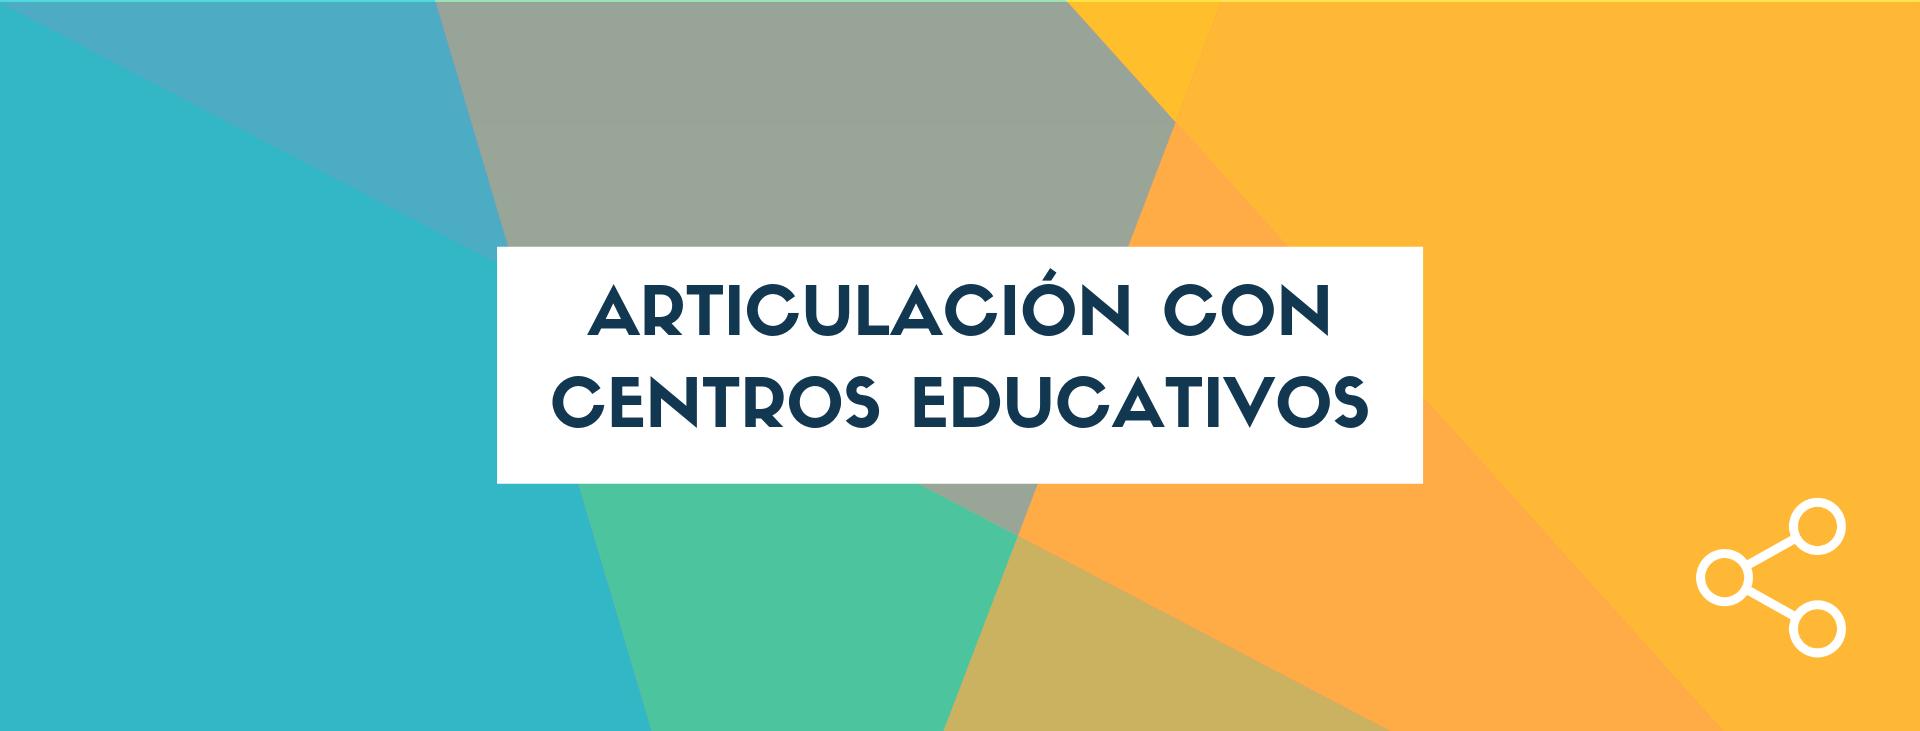 Articulación con centros educativos